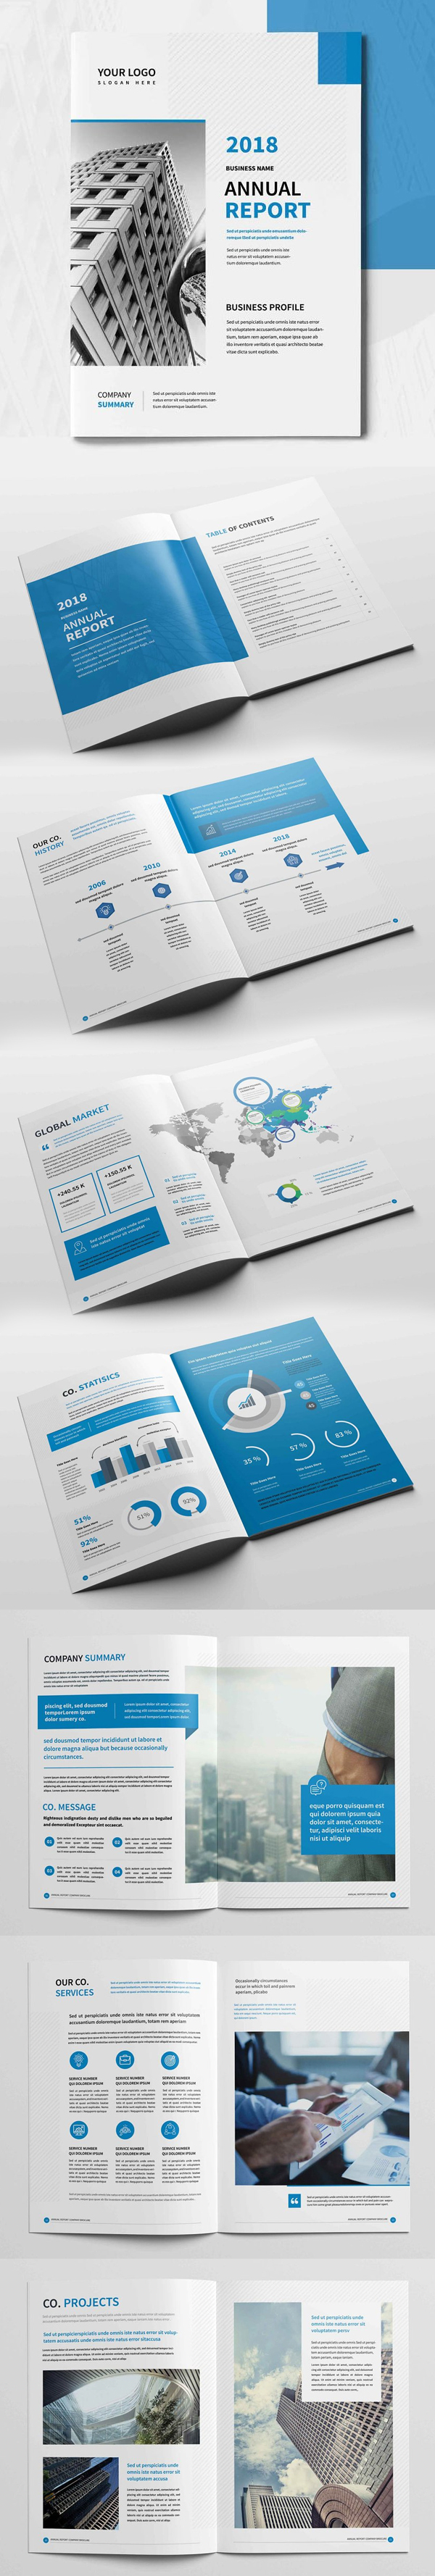 Annual Report Brochure Design Template